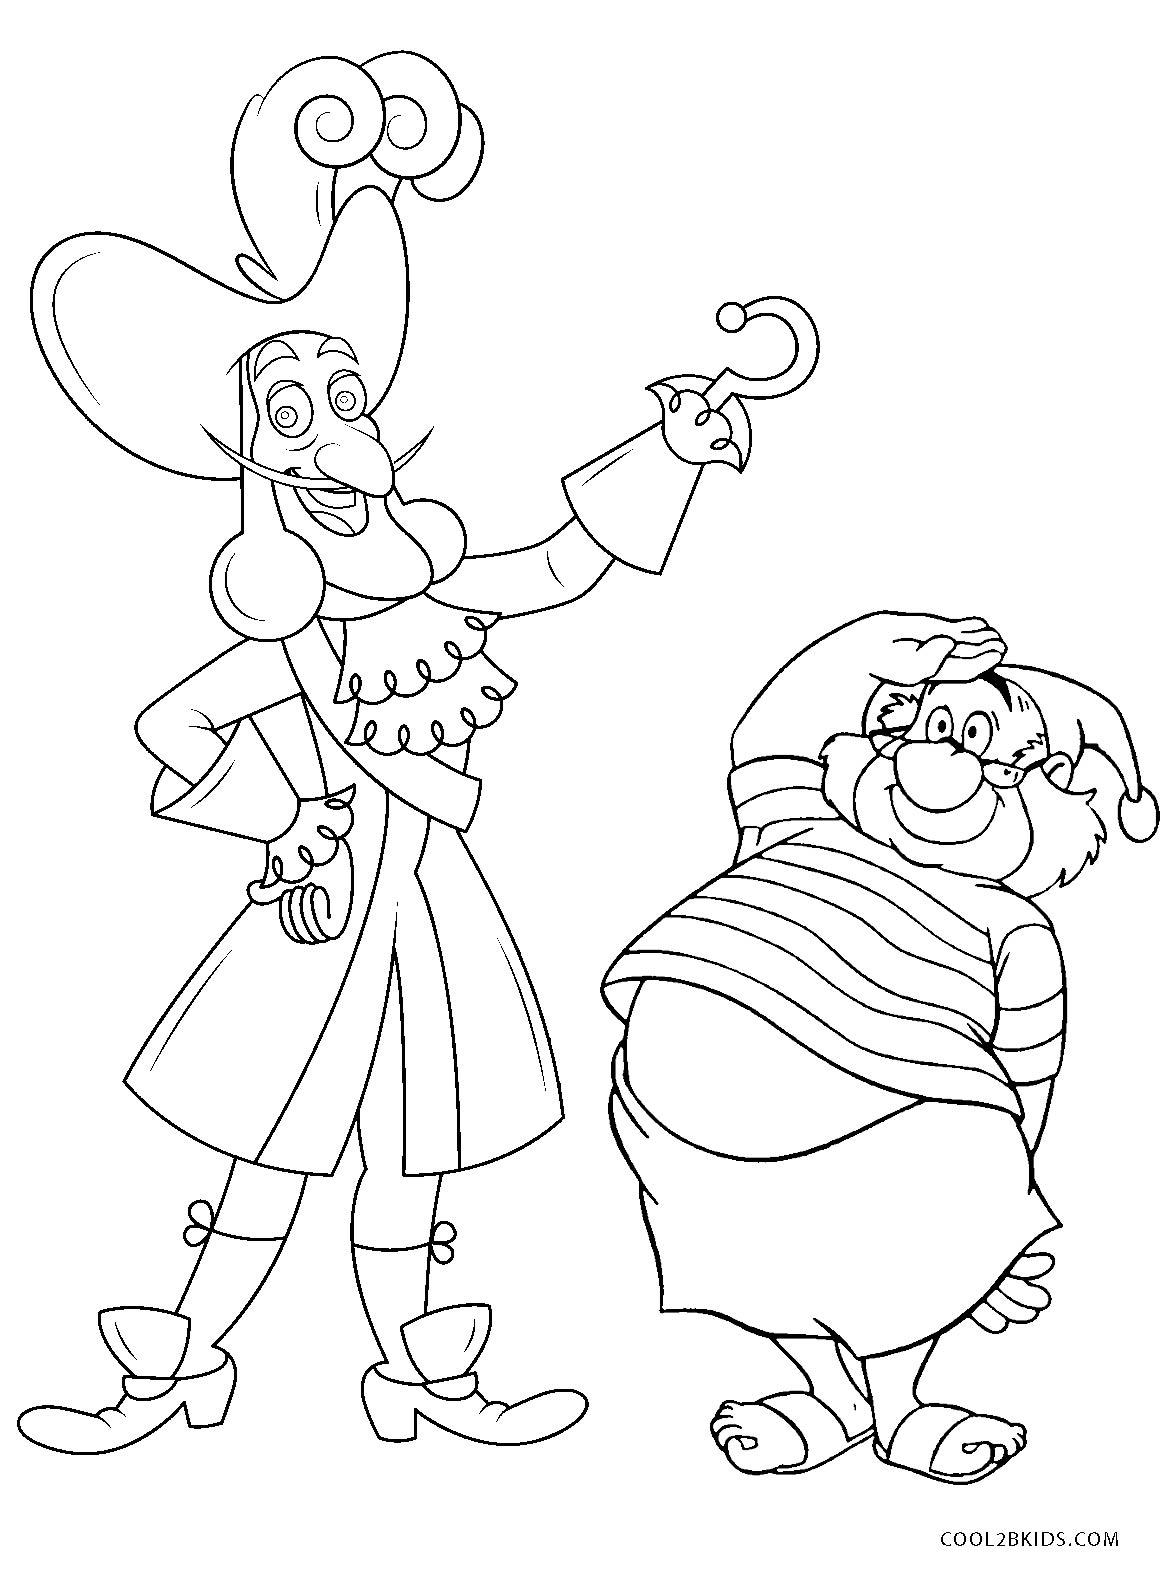 Free Printable Peter Pan Coloring